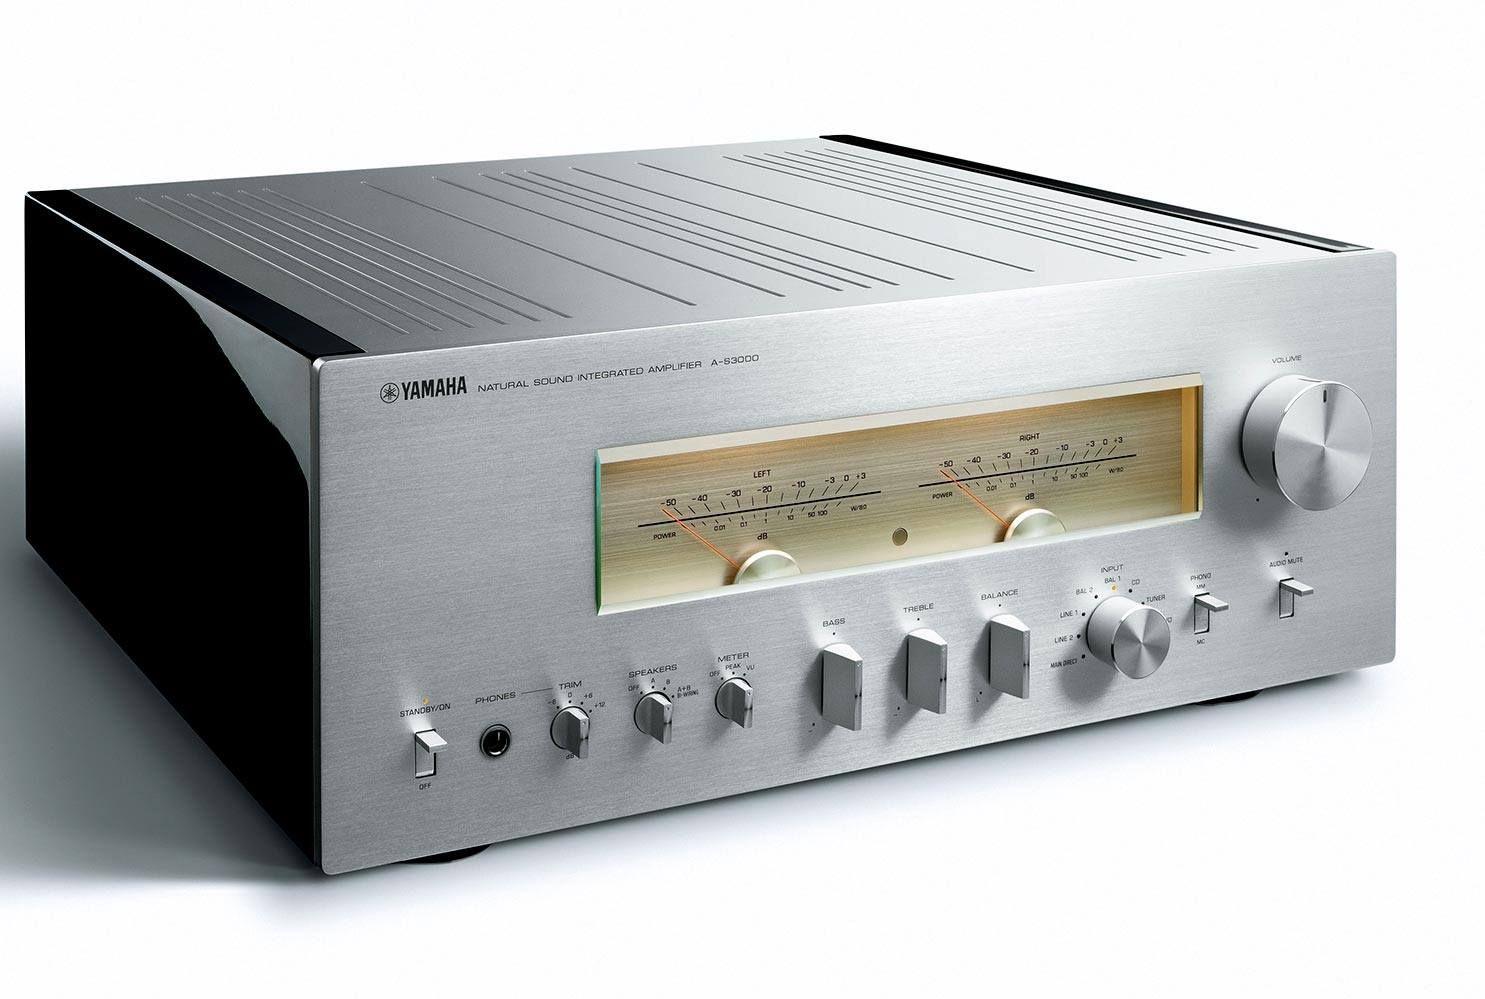 Aleks Audio Fantini 300B amplifier | Amplifiers tube in 2019 | Valve amplifier, Audio amplifier, High end audio